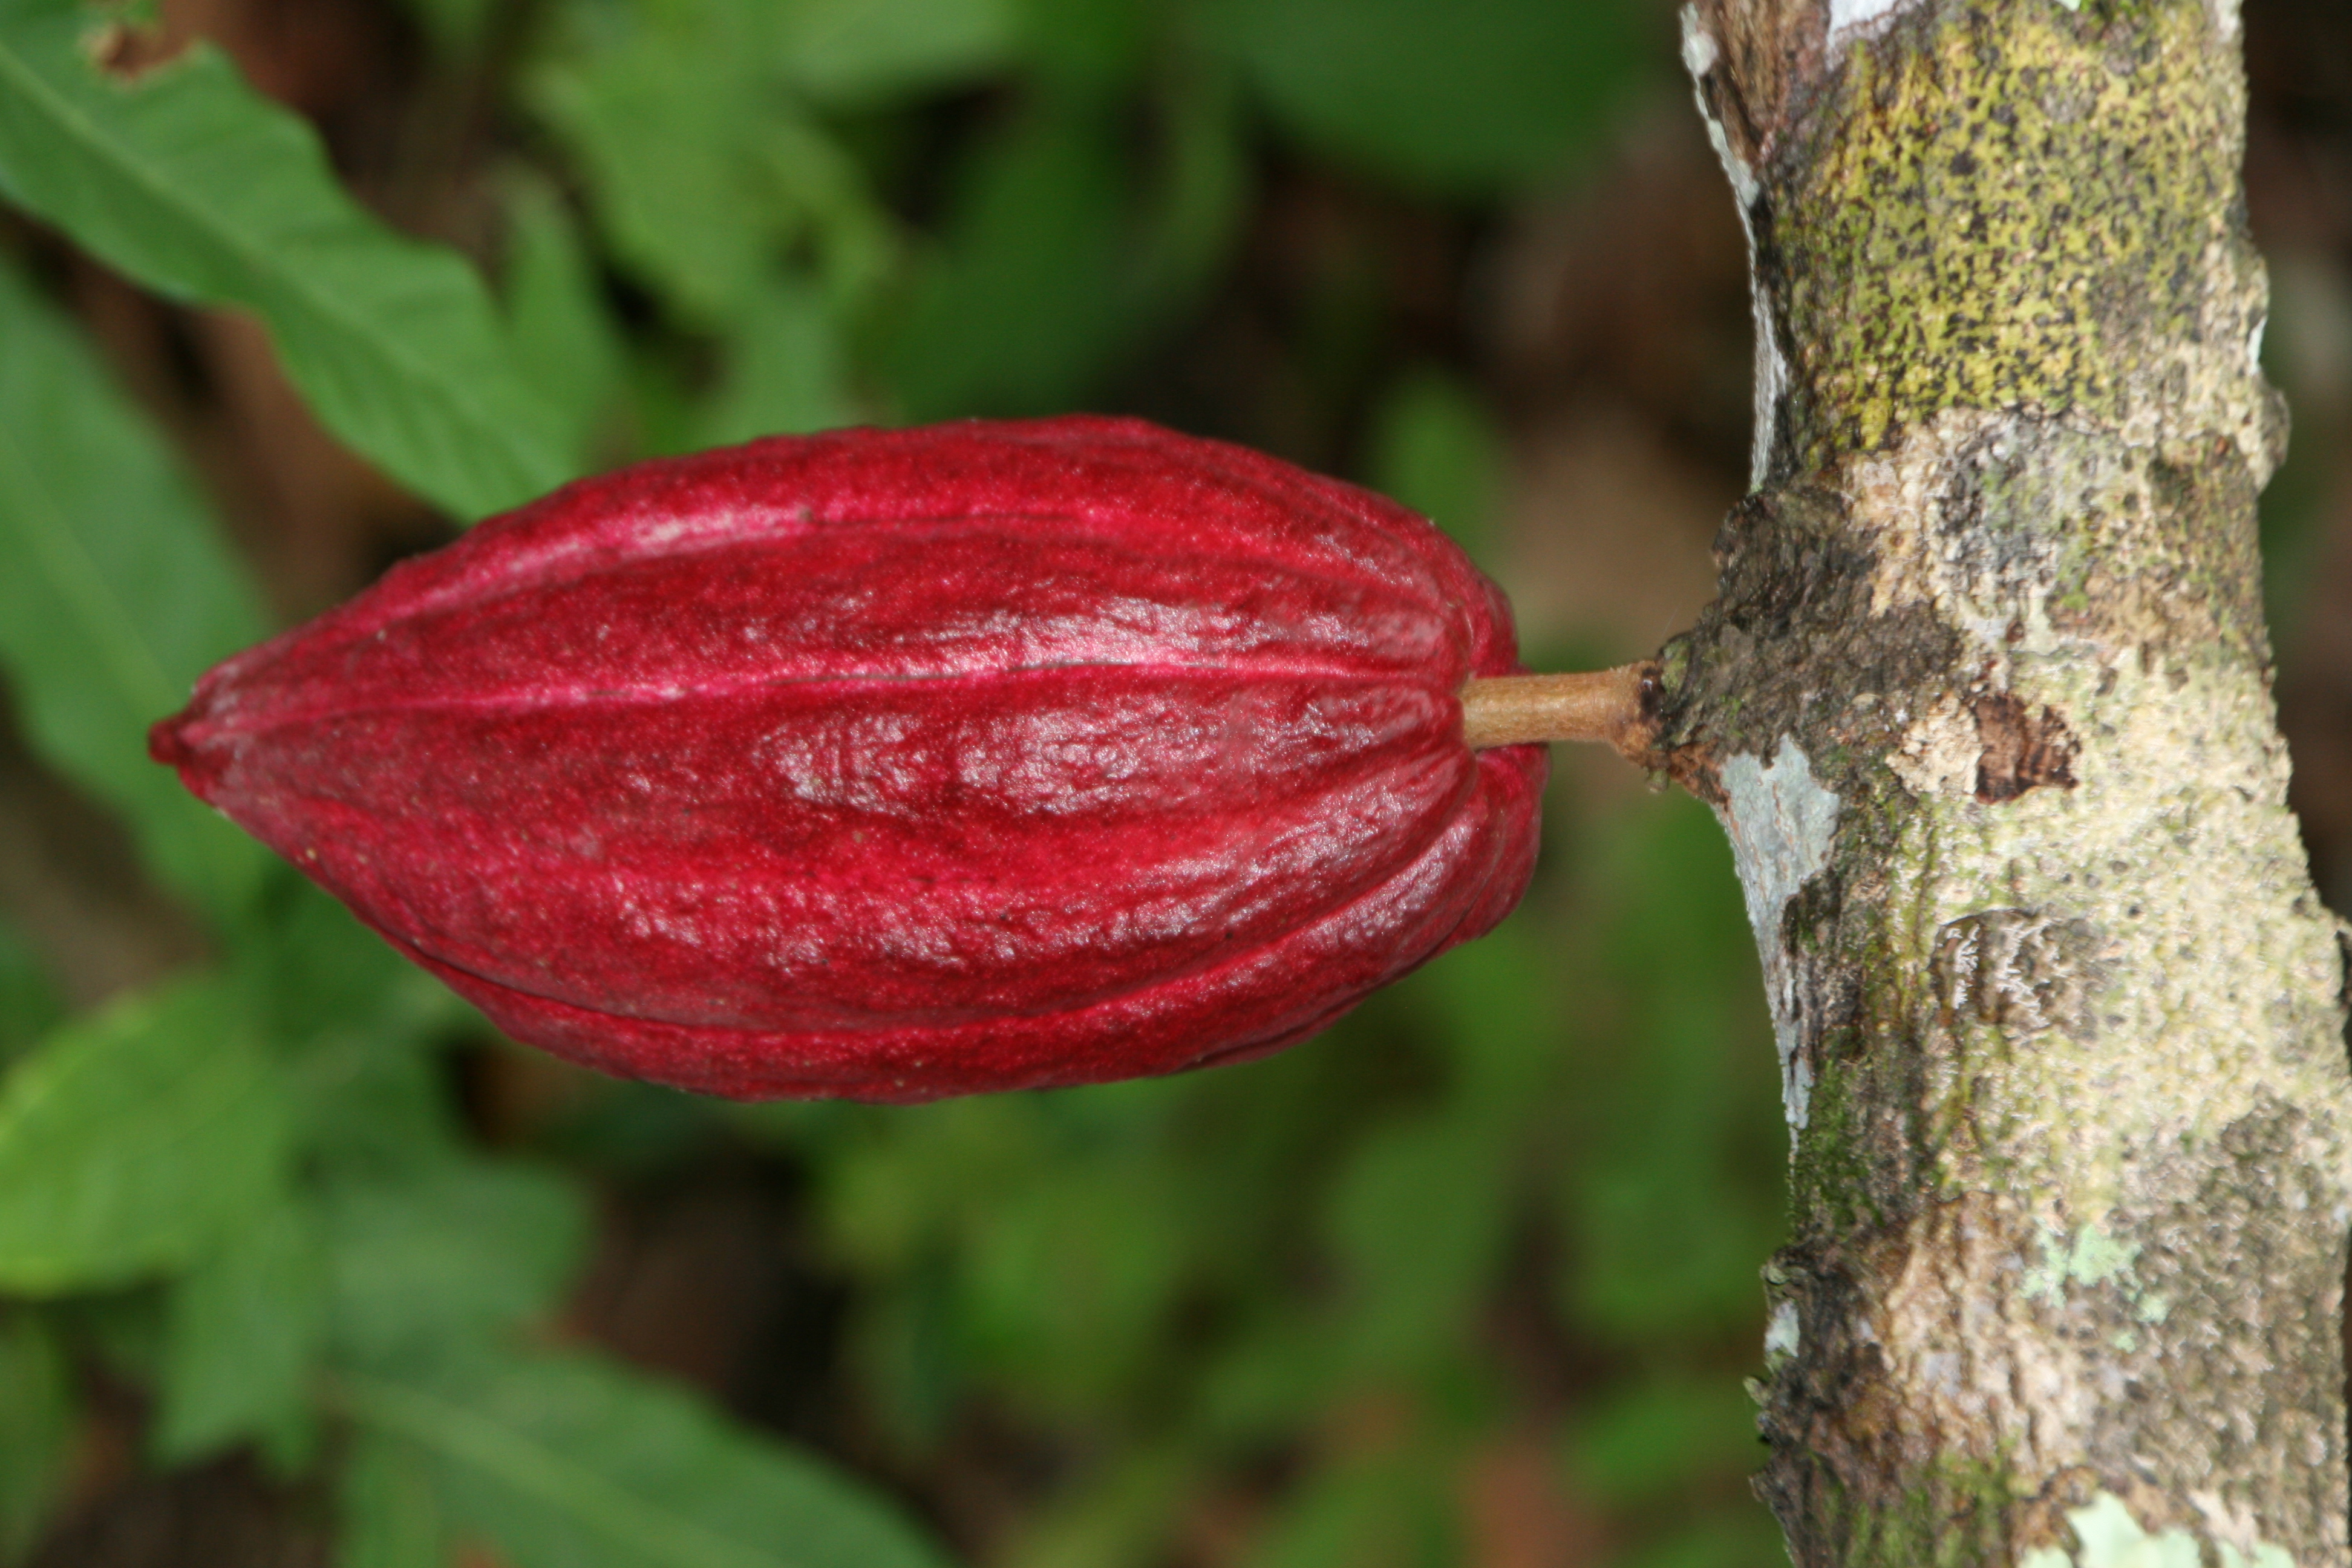 Kakao als Antioxidant, blutdrucksenkend